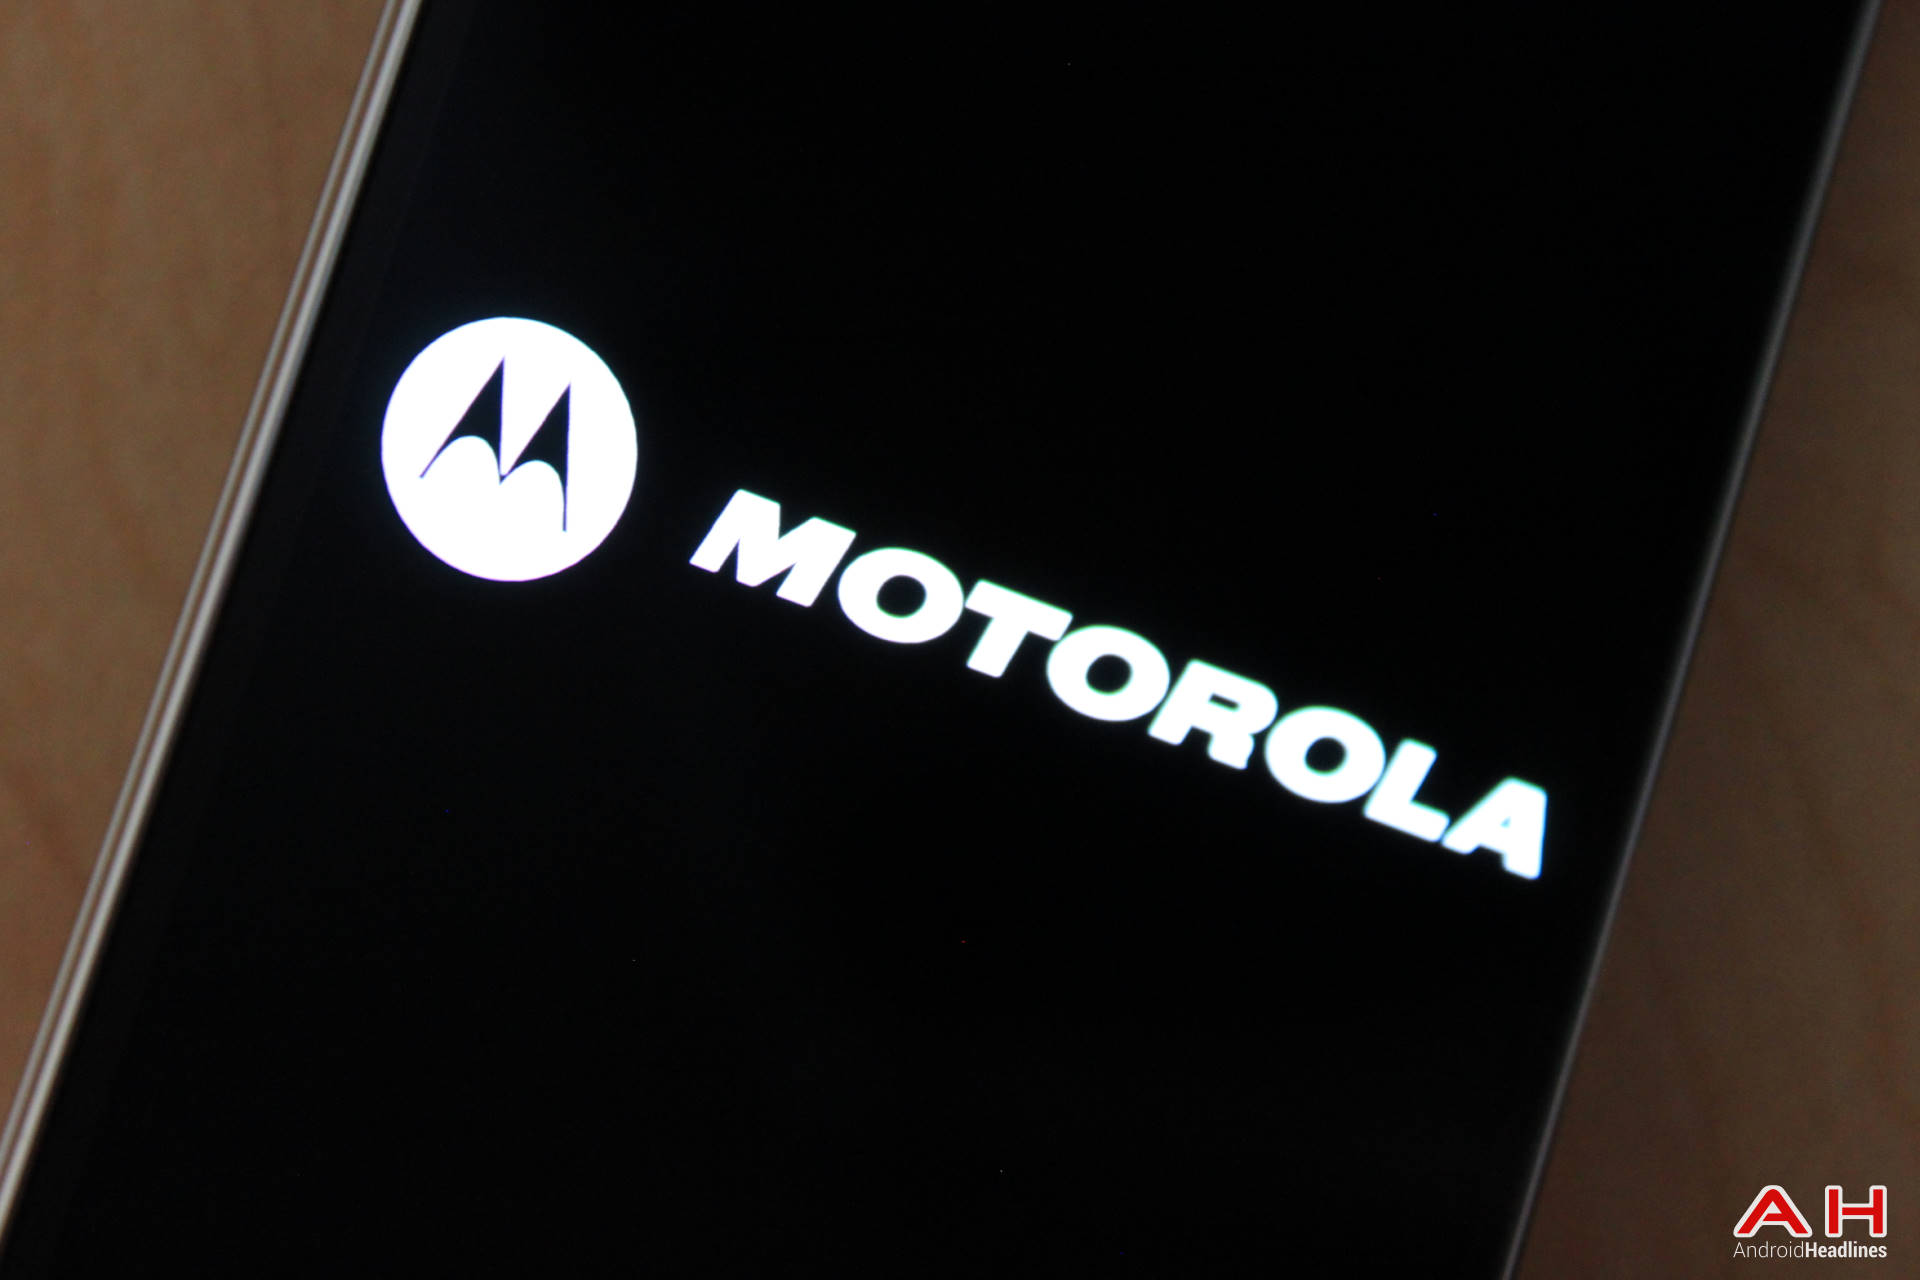 AH-Motorola-Logo-1.3